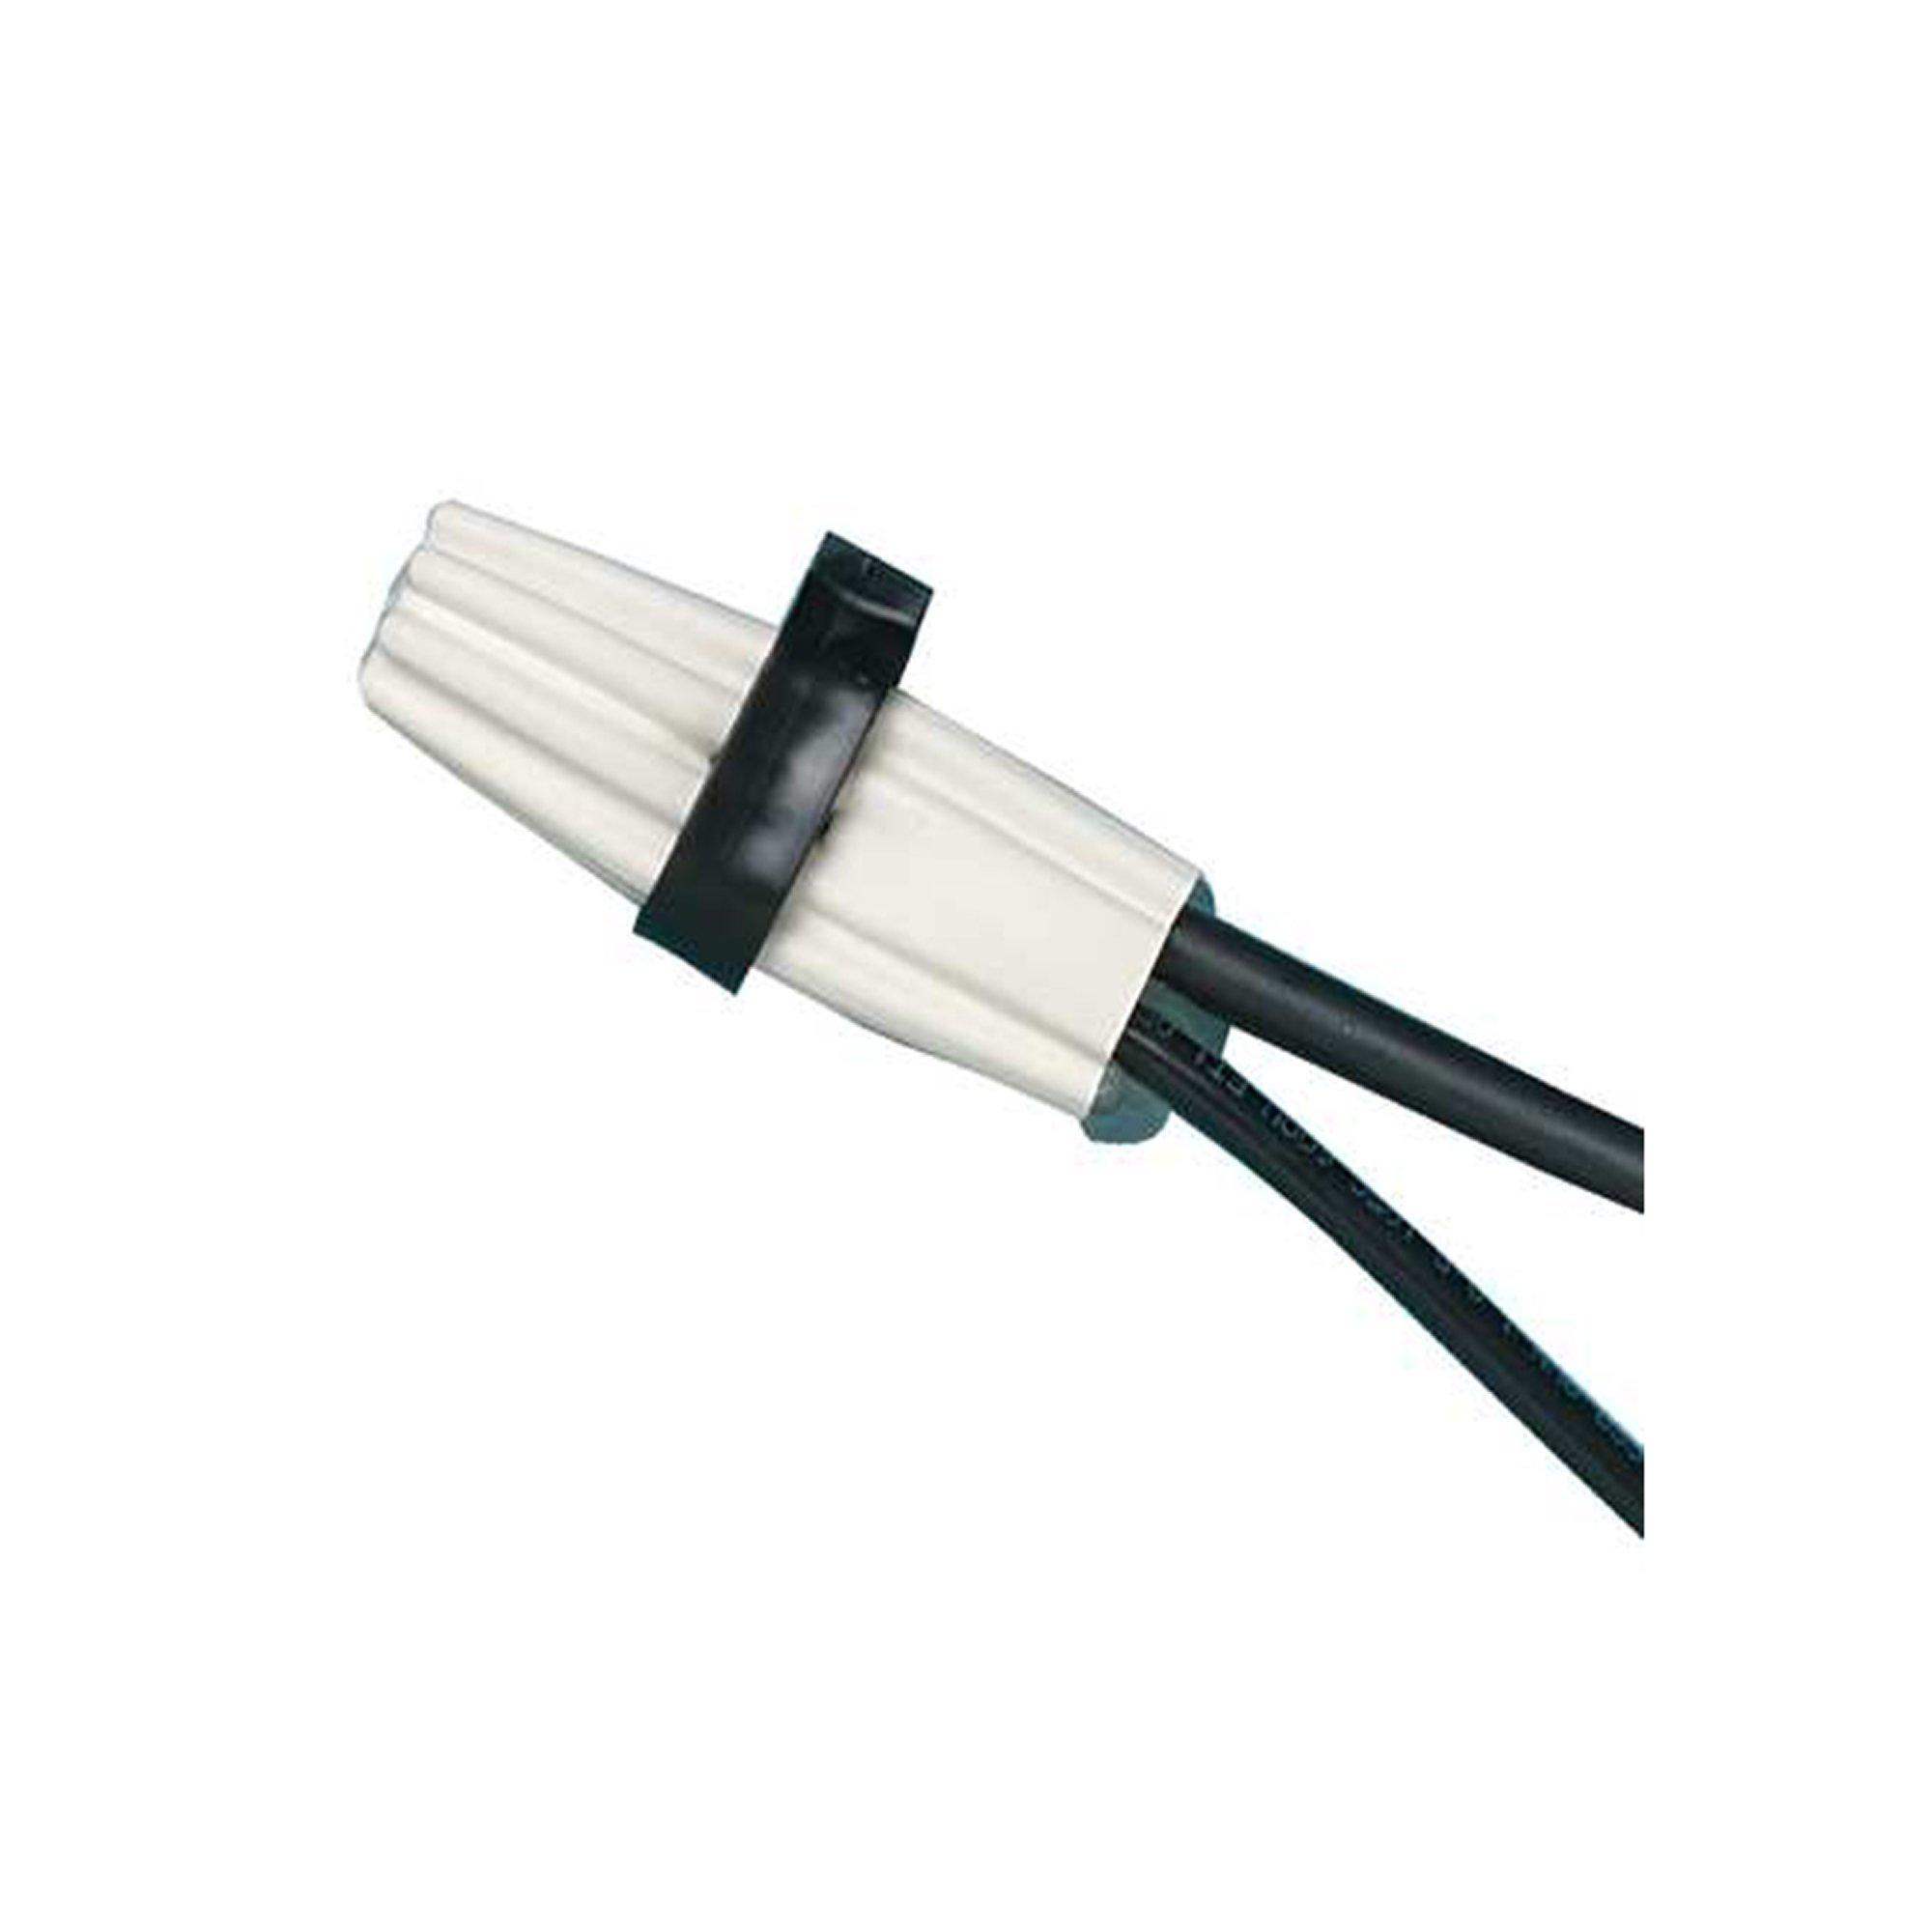 Te Connectivity Gelcap-4 Power Gel Srub Splice Wire Ducting (3 Caps Per Package)